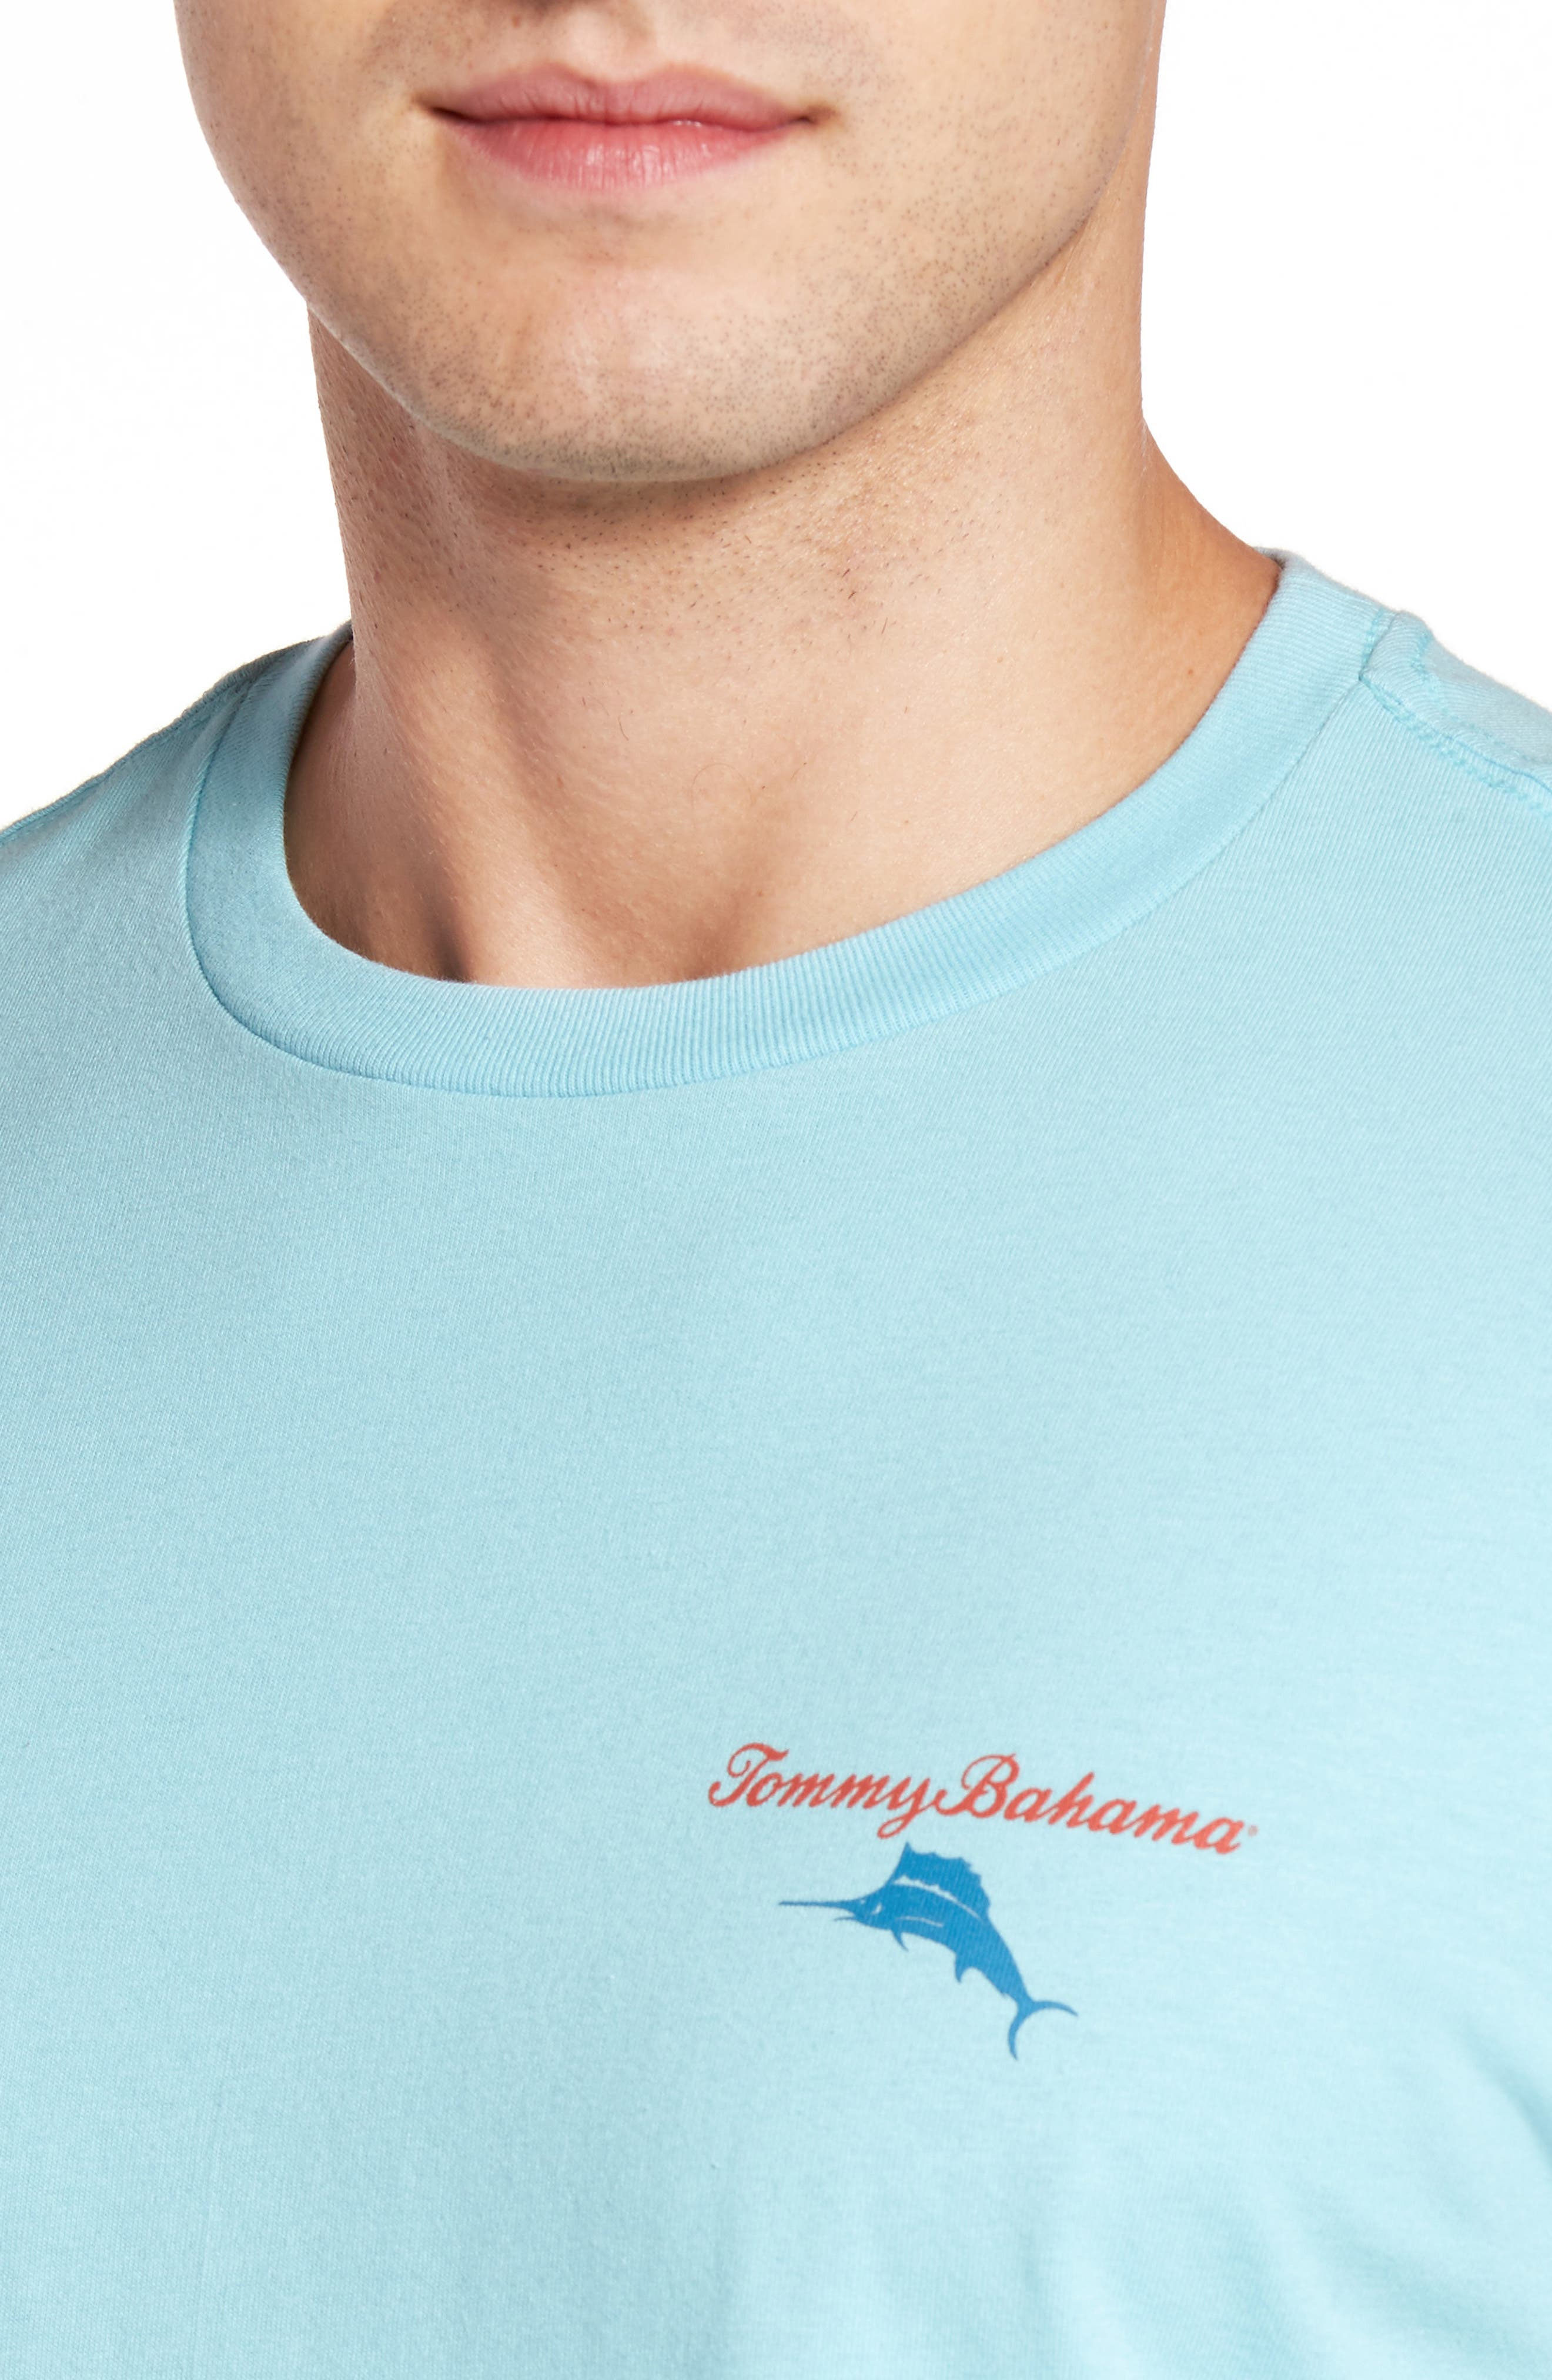 Mr. Ice Guy T-Shirt,                             Alternate thumbnail 4, color,